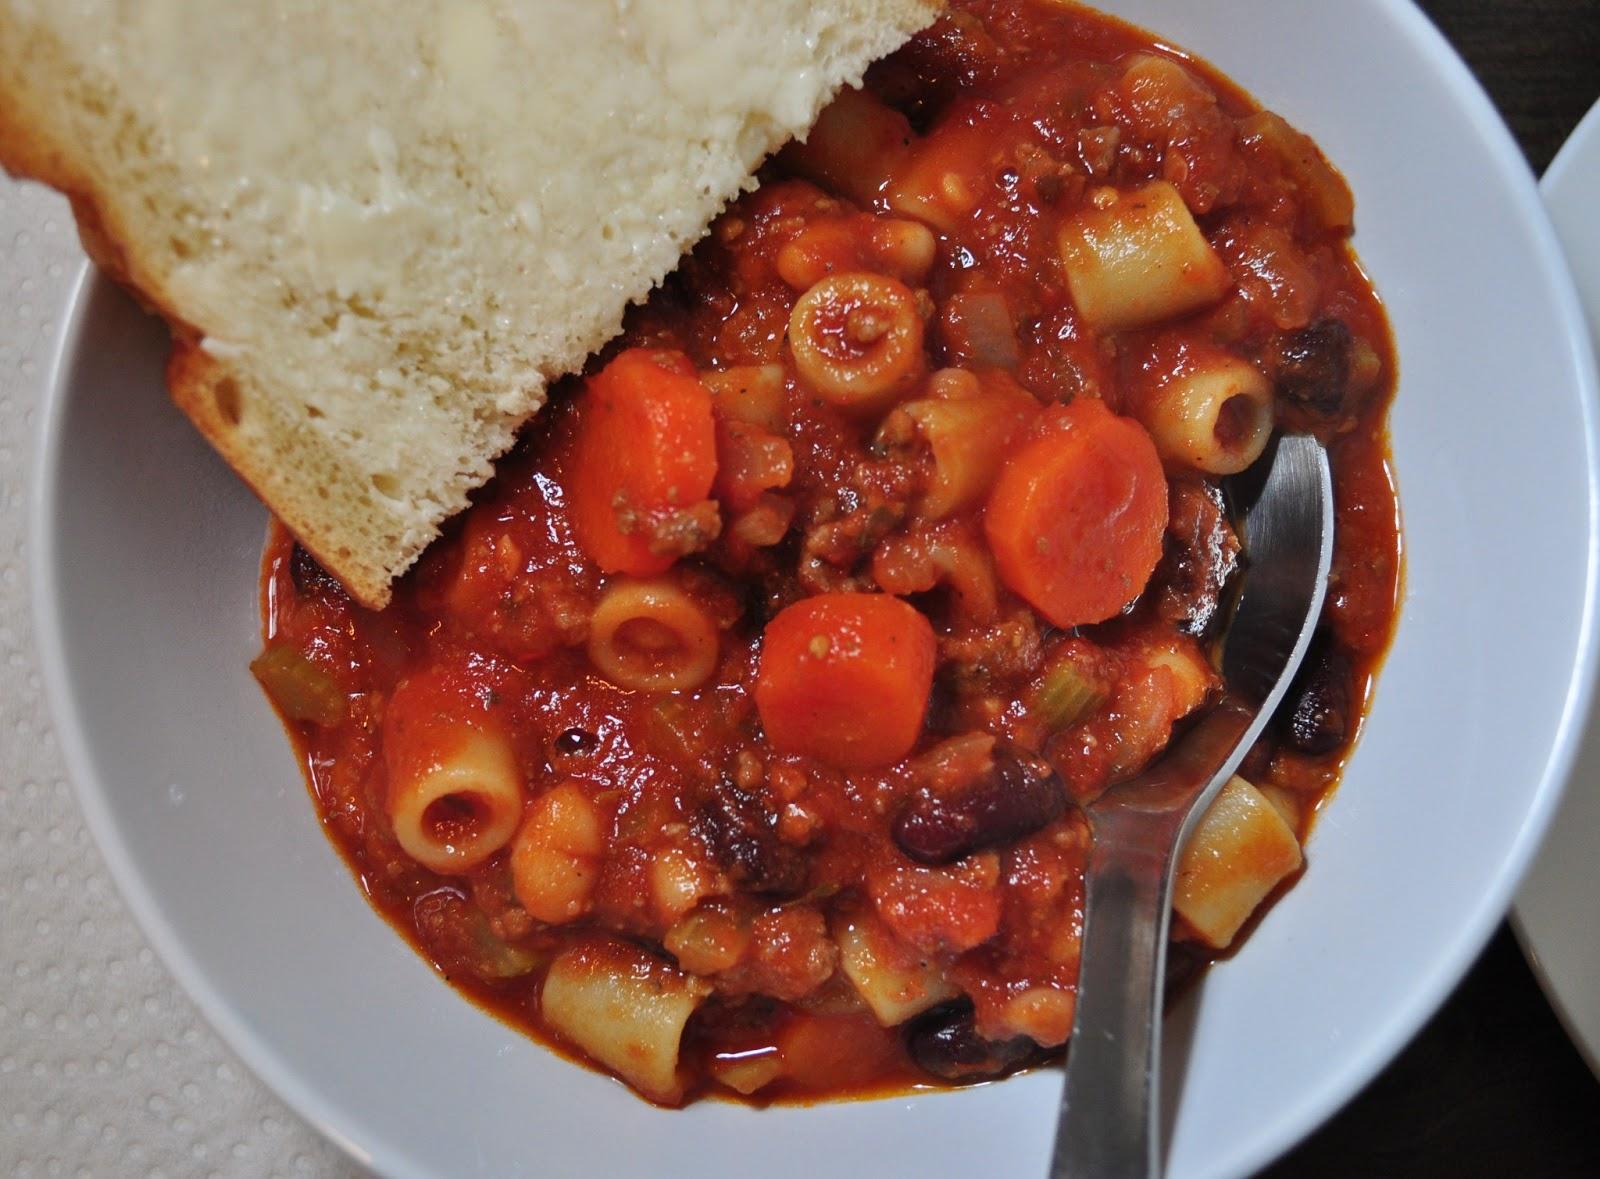 My Tiny Oven A Copycat Version Of Olive Garden S Pasta E Fagioli Soup